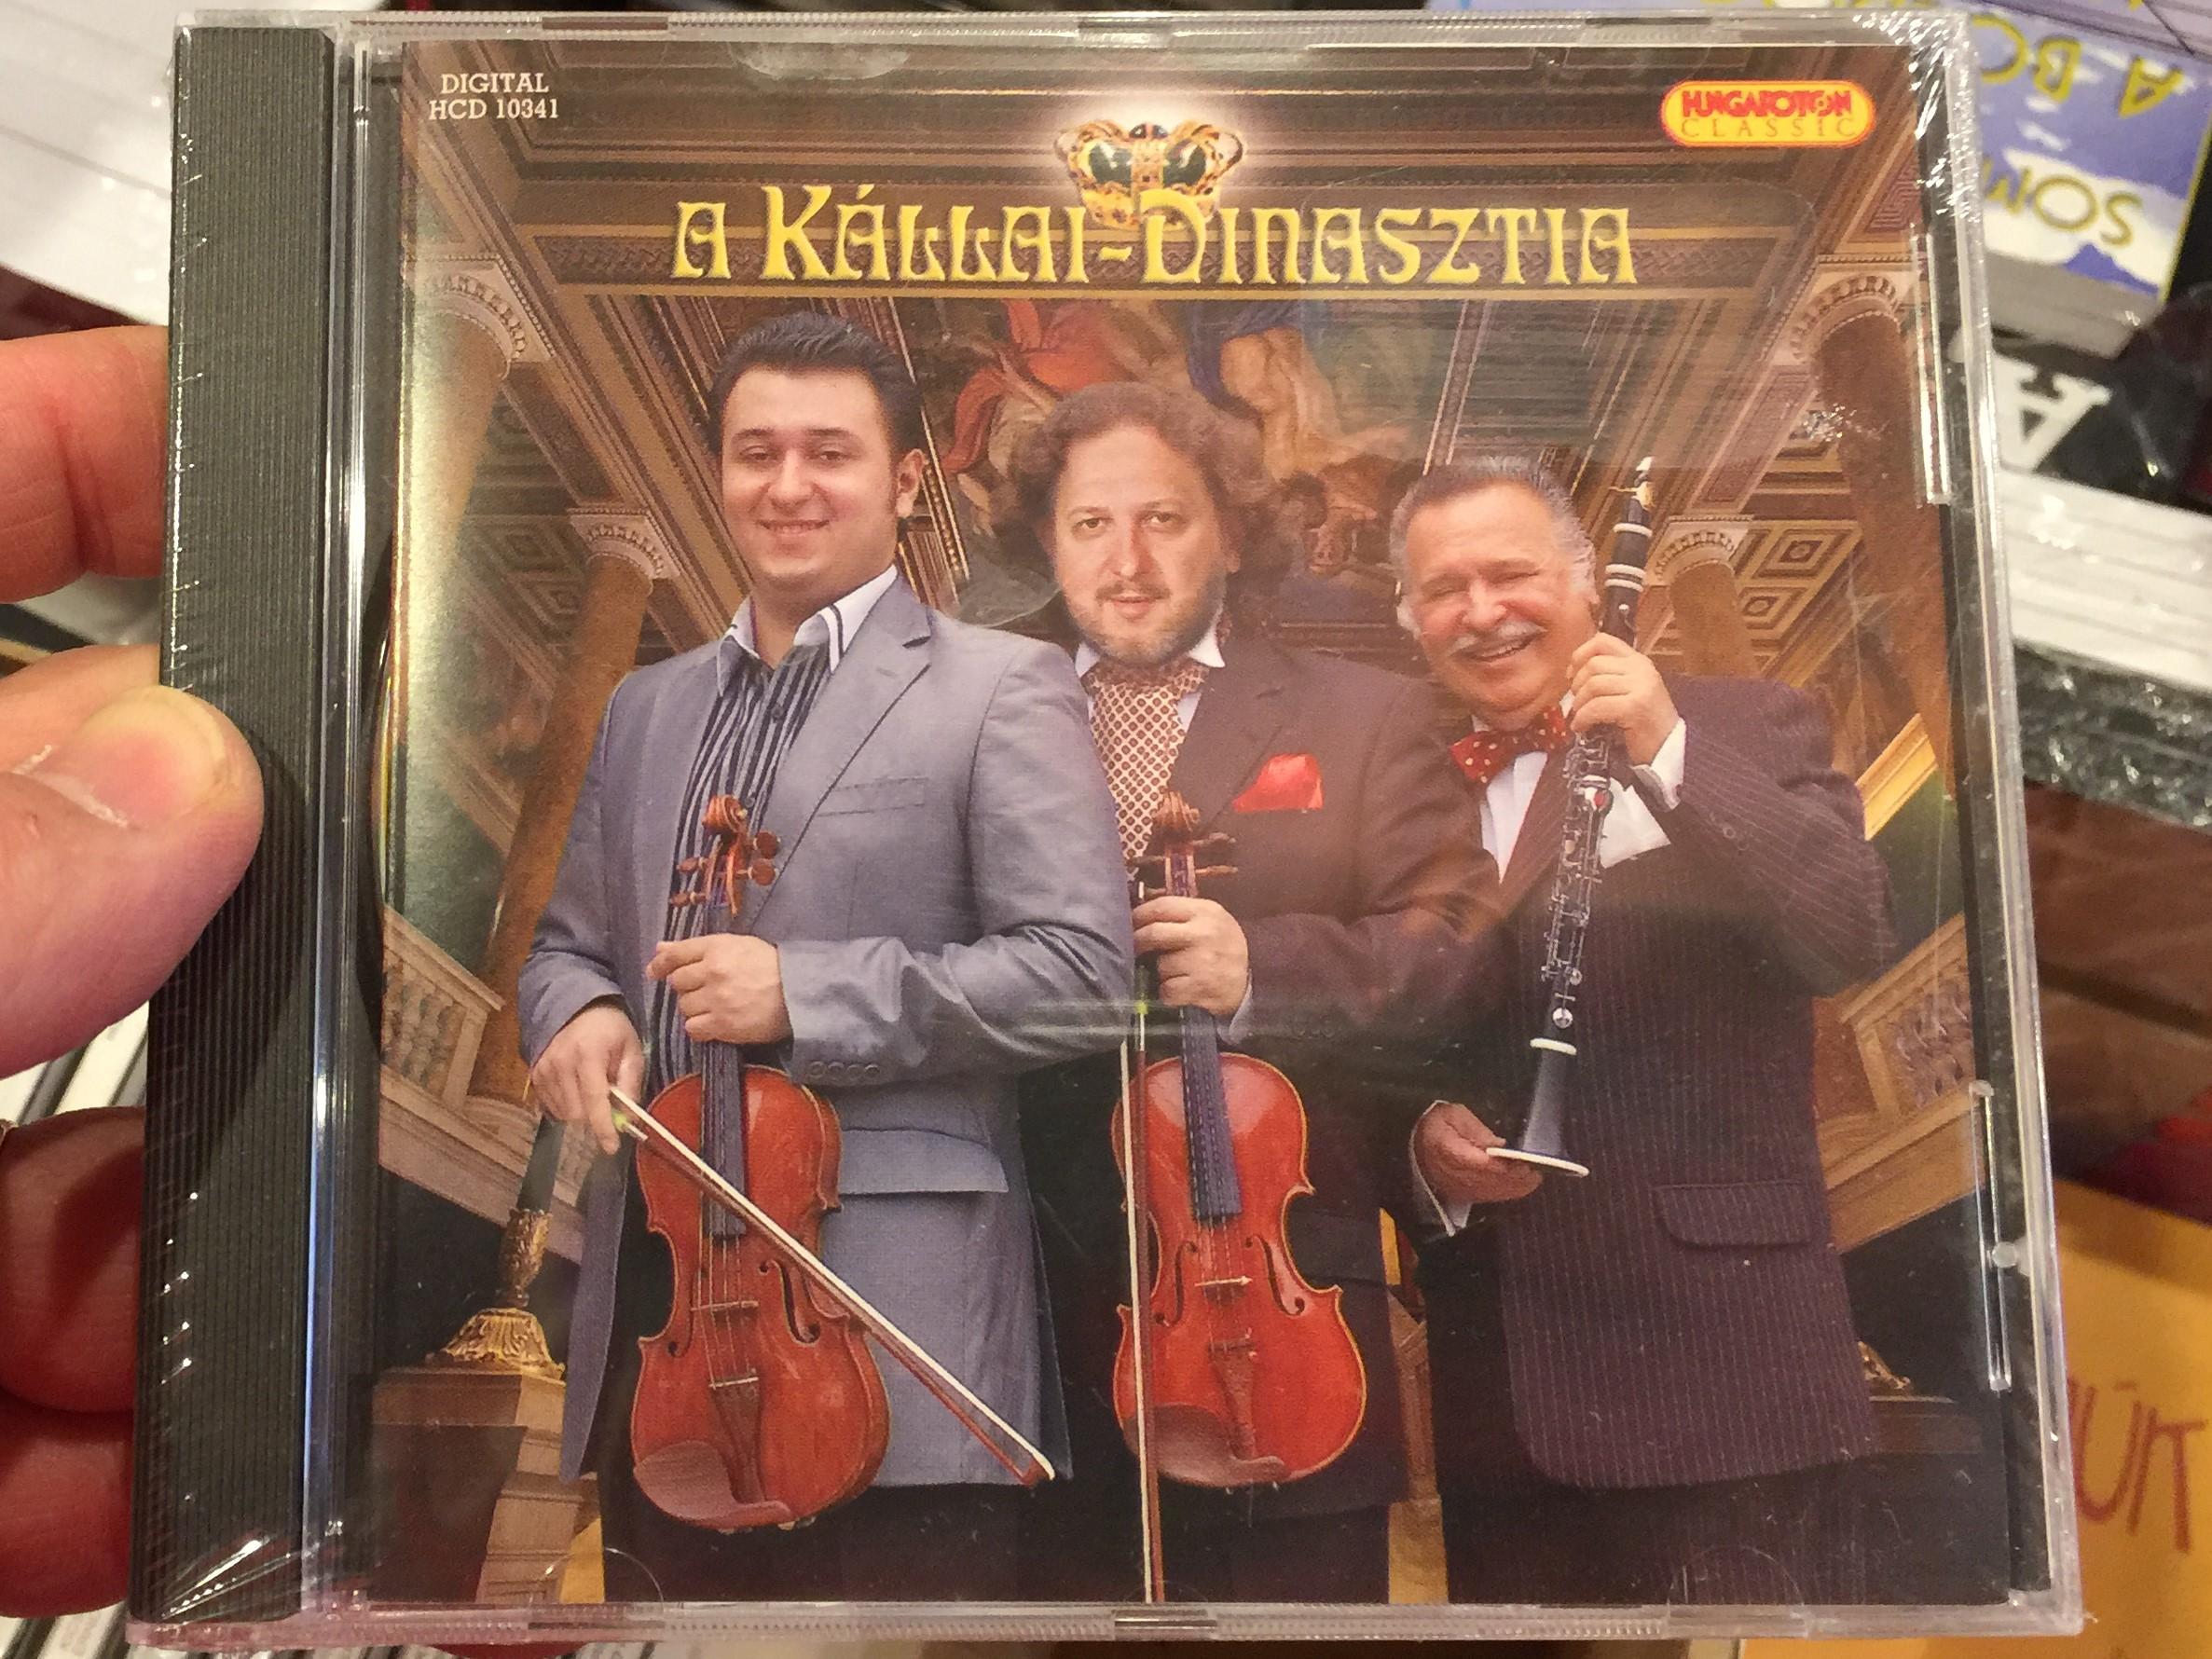 a-kallai-dinasztia-hungaroton-classic-audio-cd-2010-stereo-hcd-10341-1-.jpg